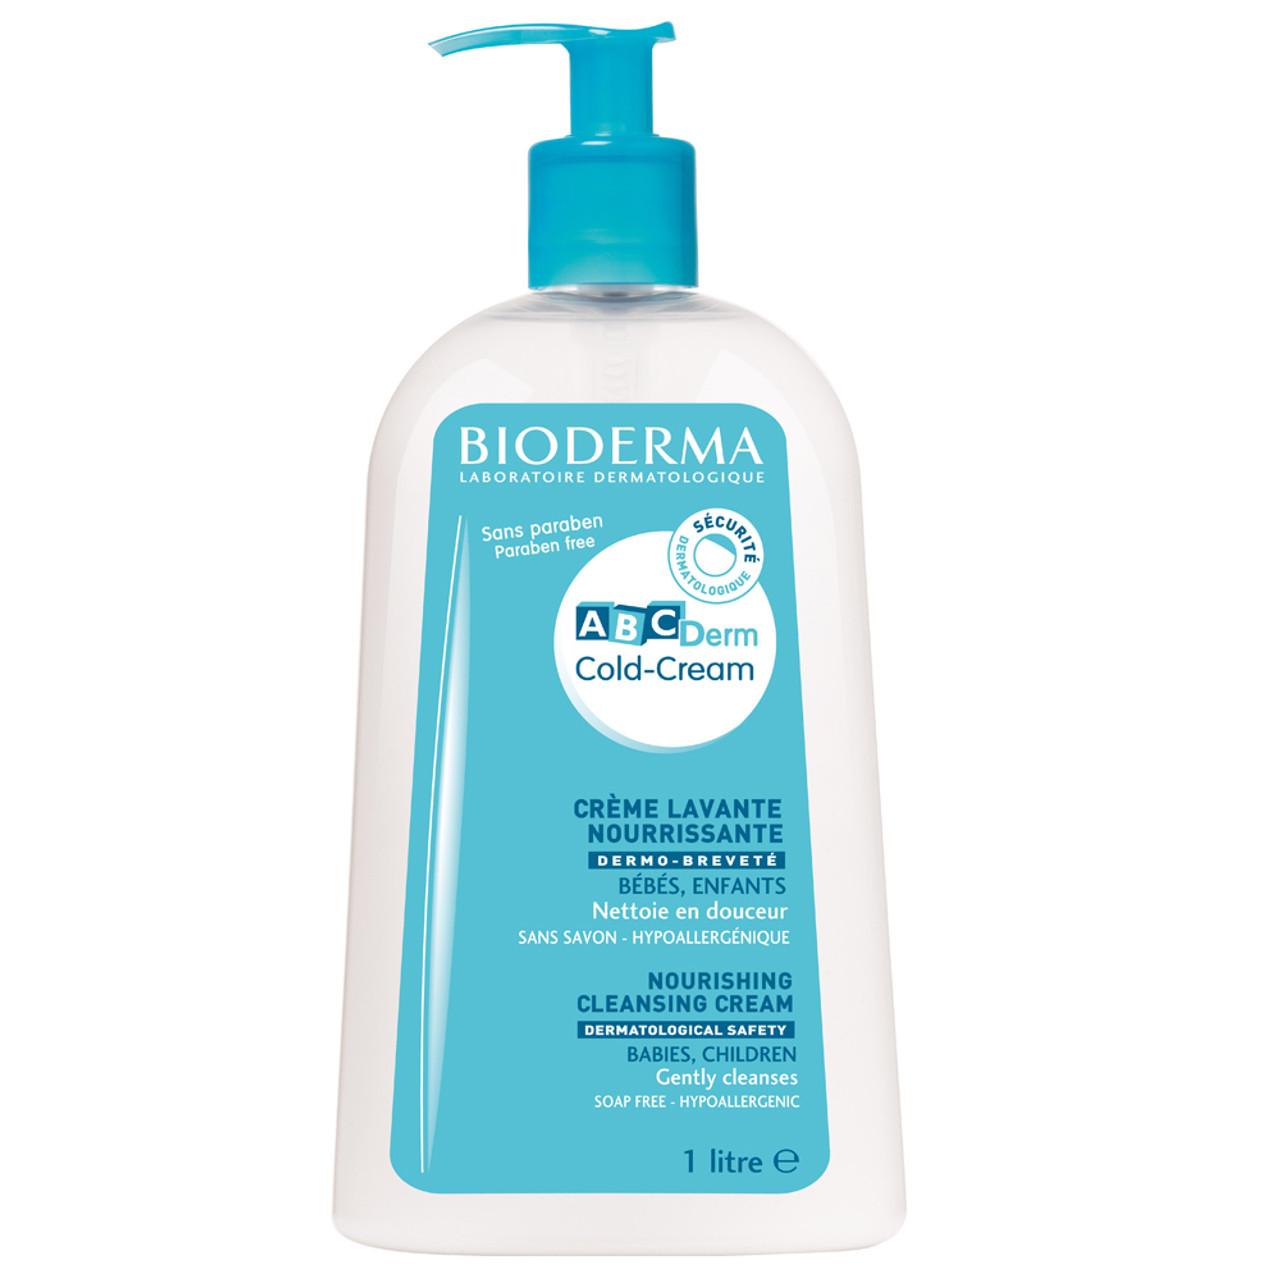 Bioderma ABCDerm Cold Cream Cleansing Cream